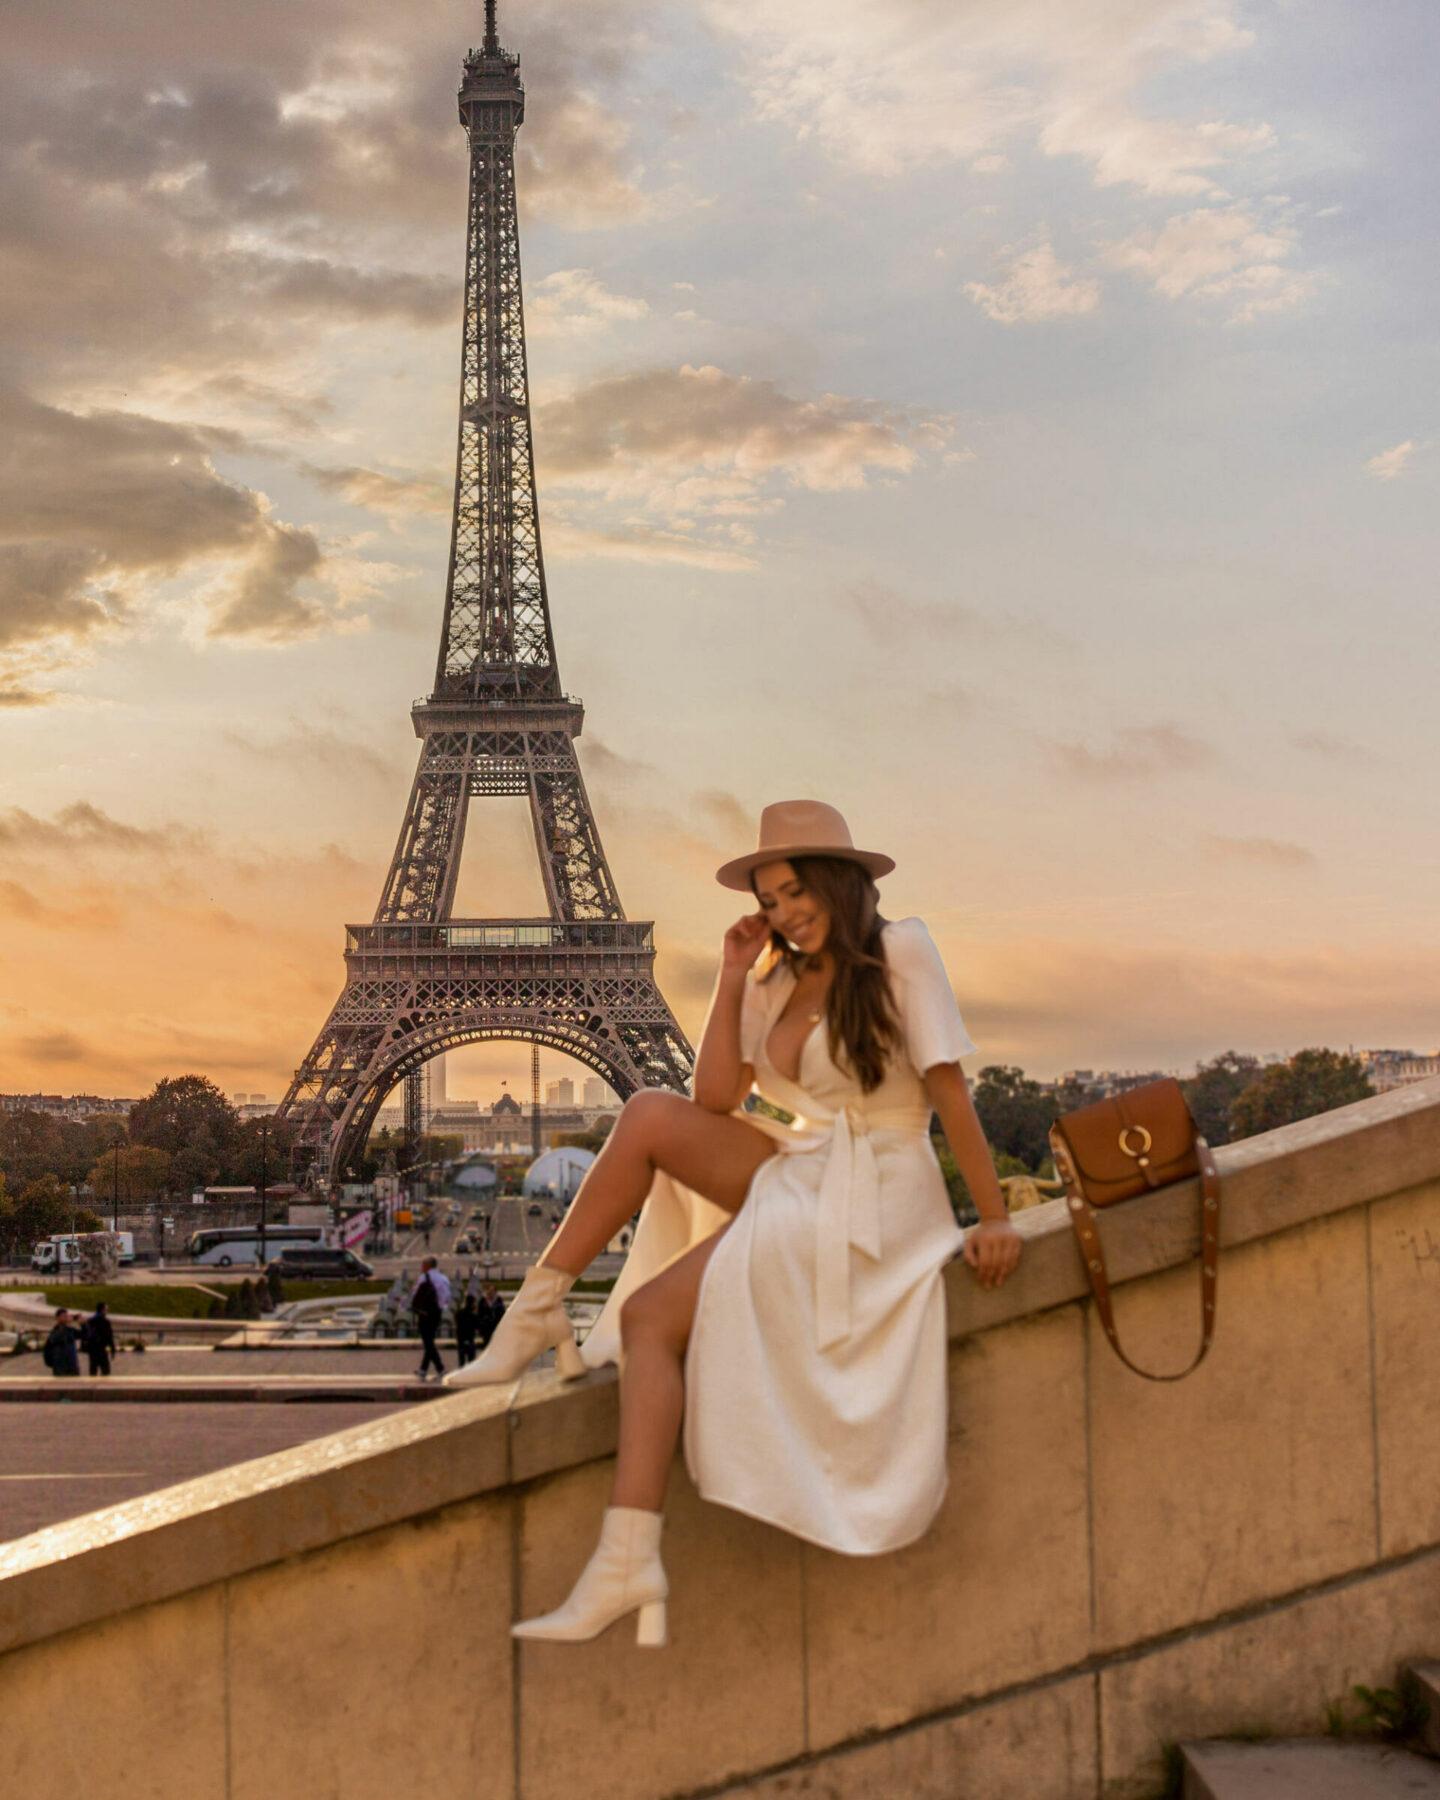 Paris Instagrammable Locations kelseyinlondon kelsey heinrichs things to do in Paris bucketlist eiffel tower Trocadéro